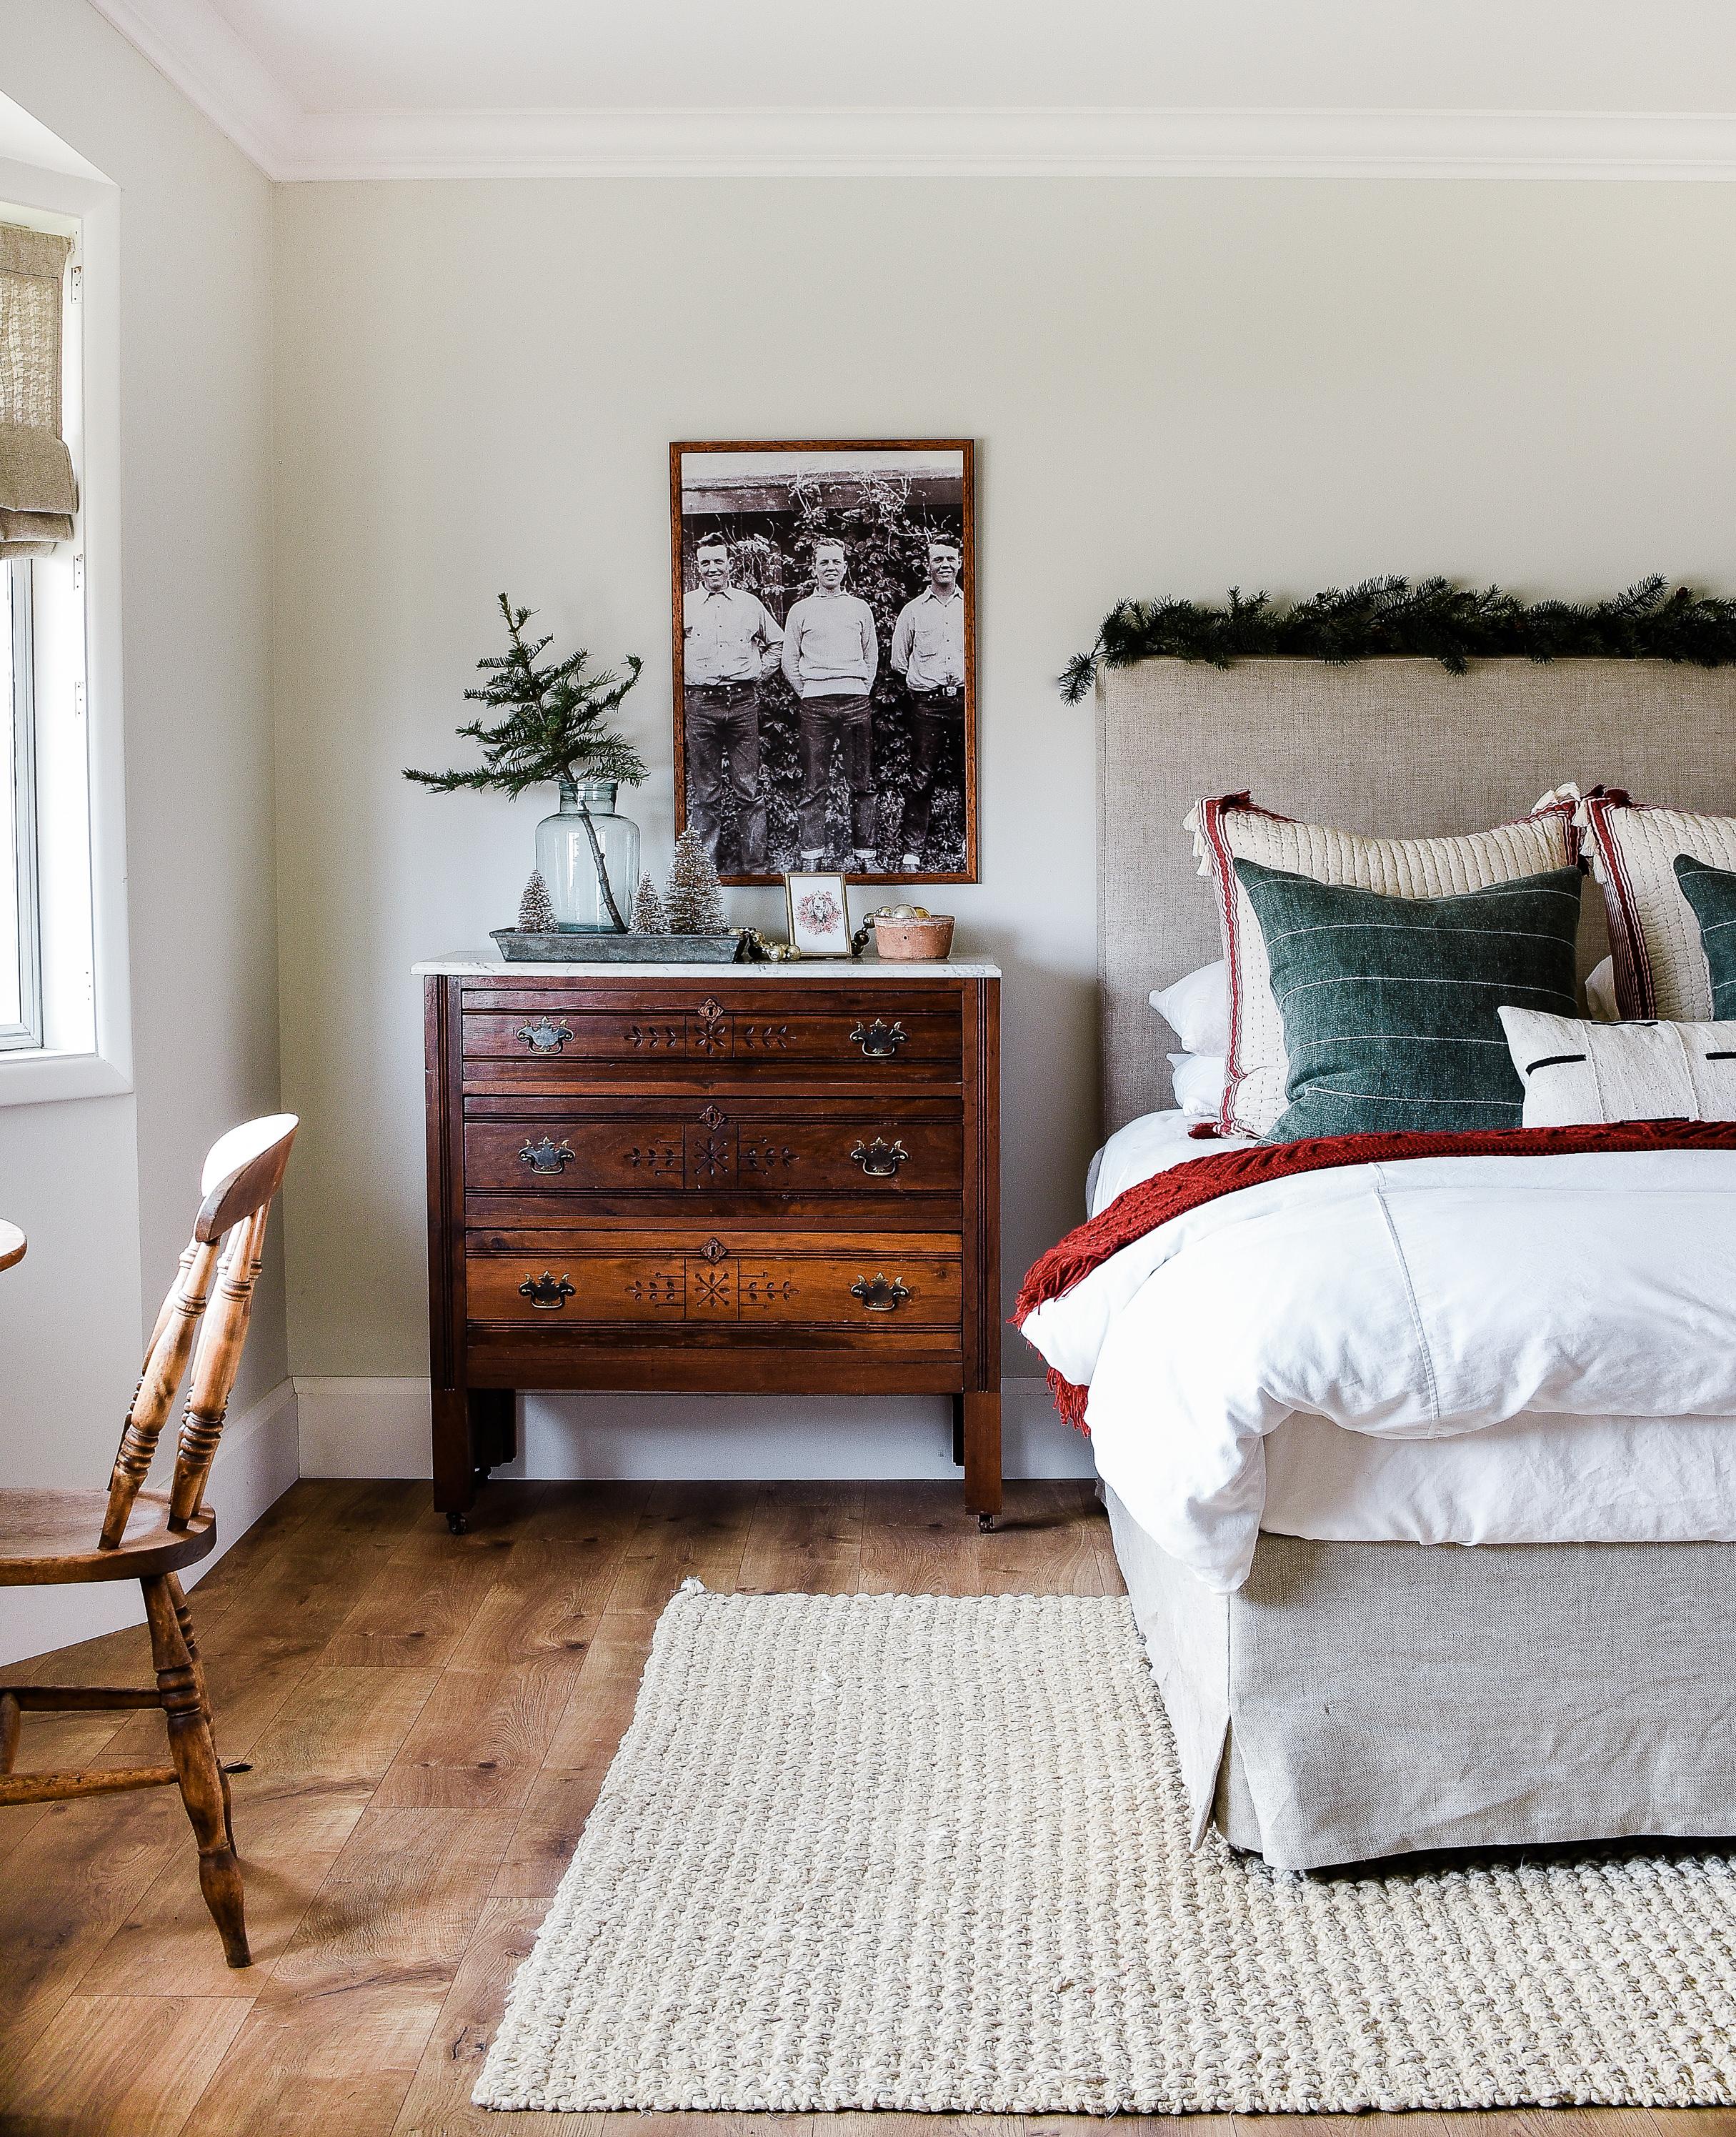 Guest bedroom cozy for Christmas with farmhouse decor | boxwoodavenue.com